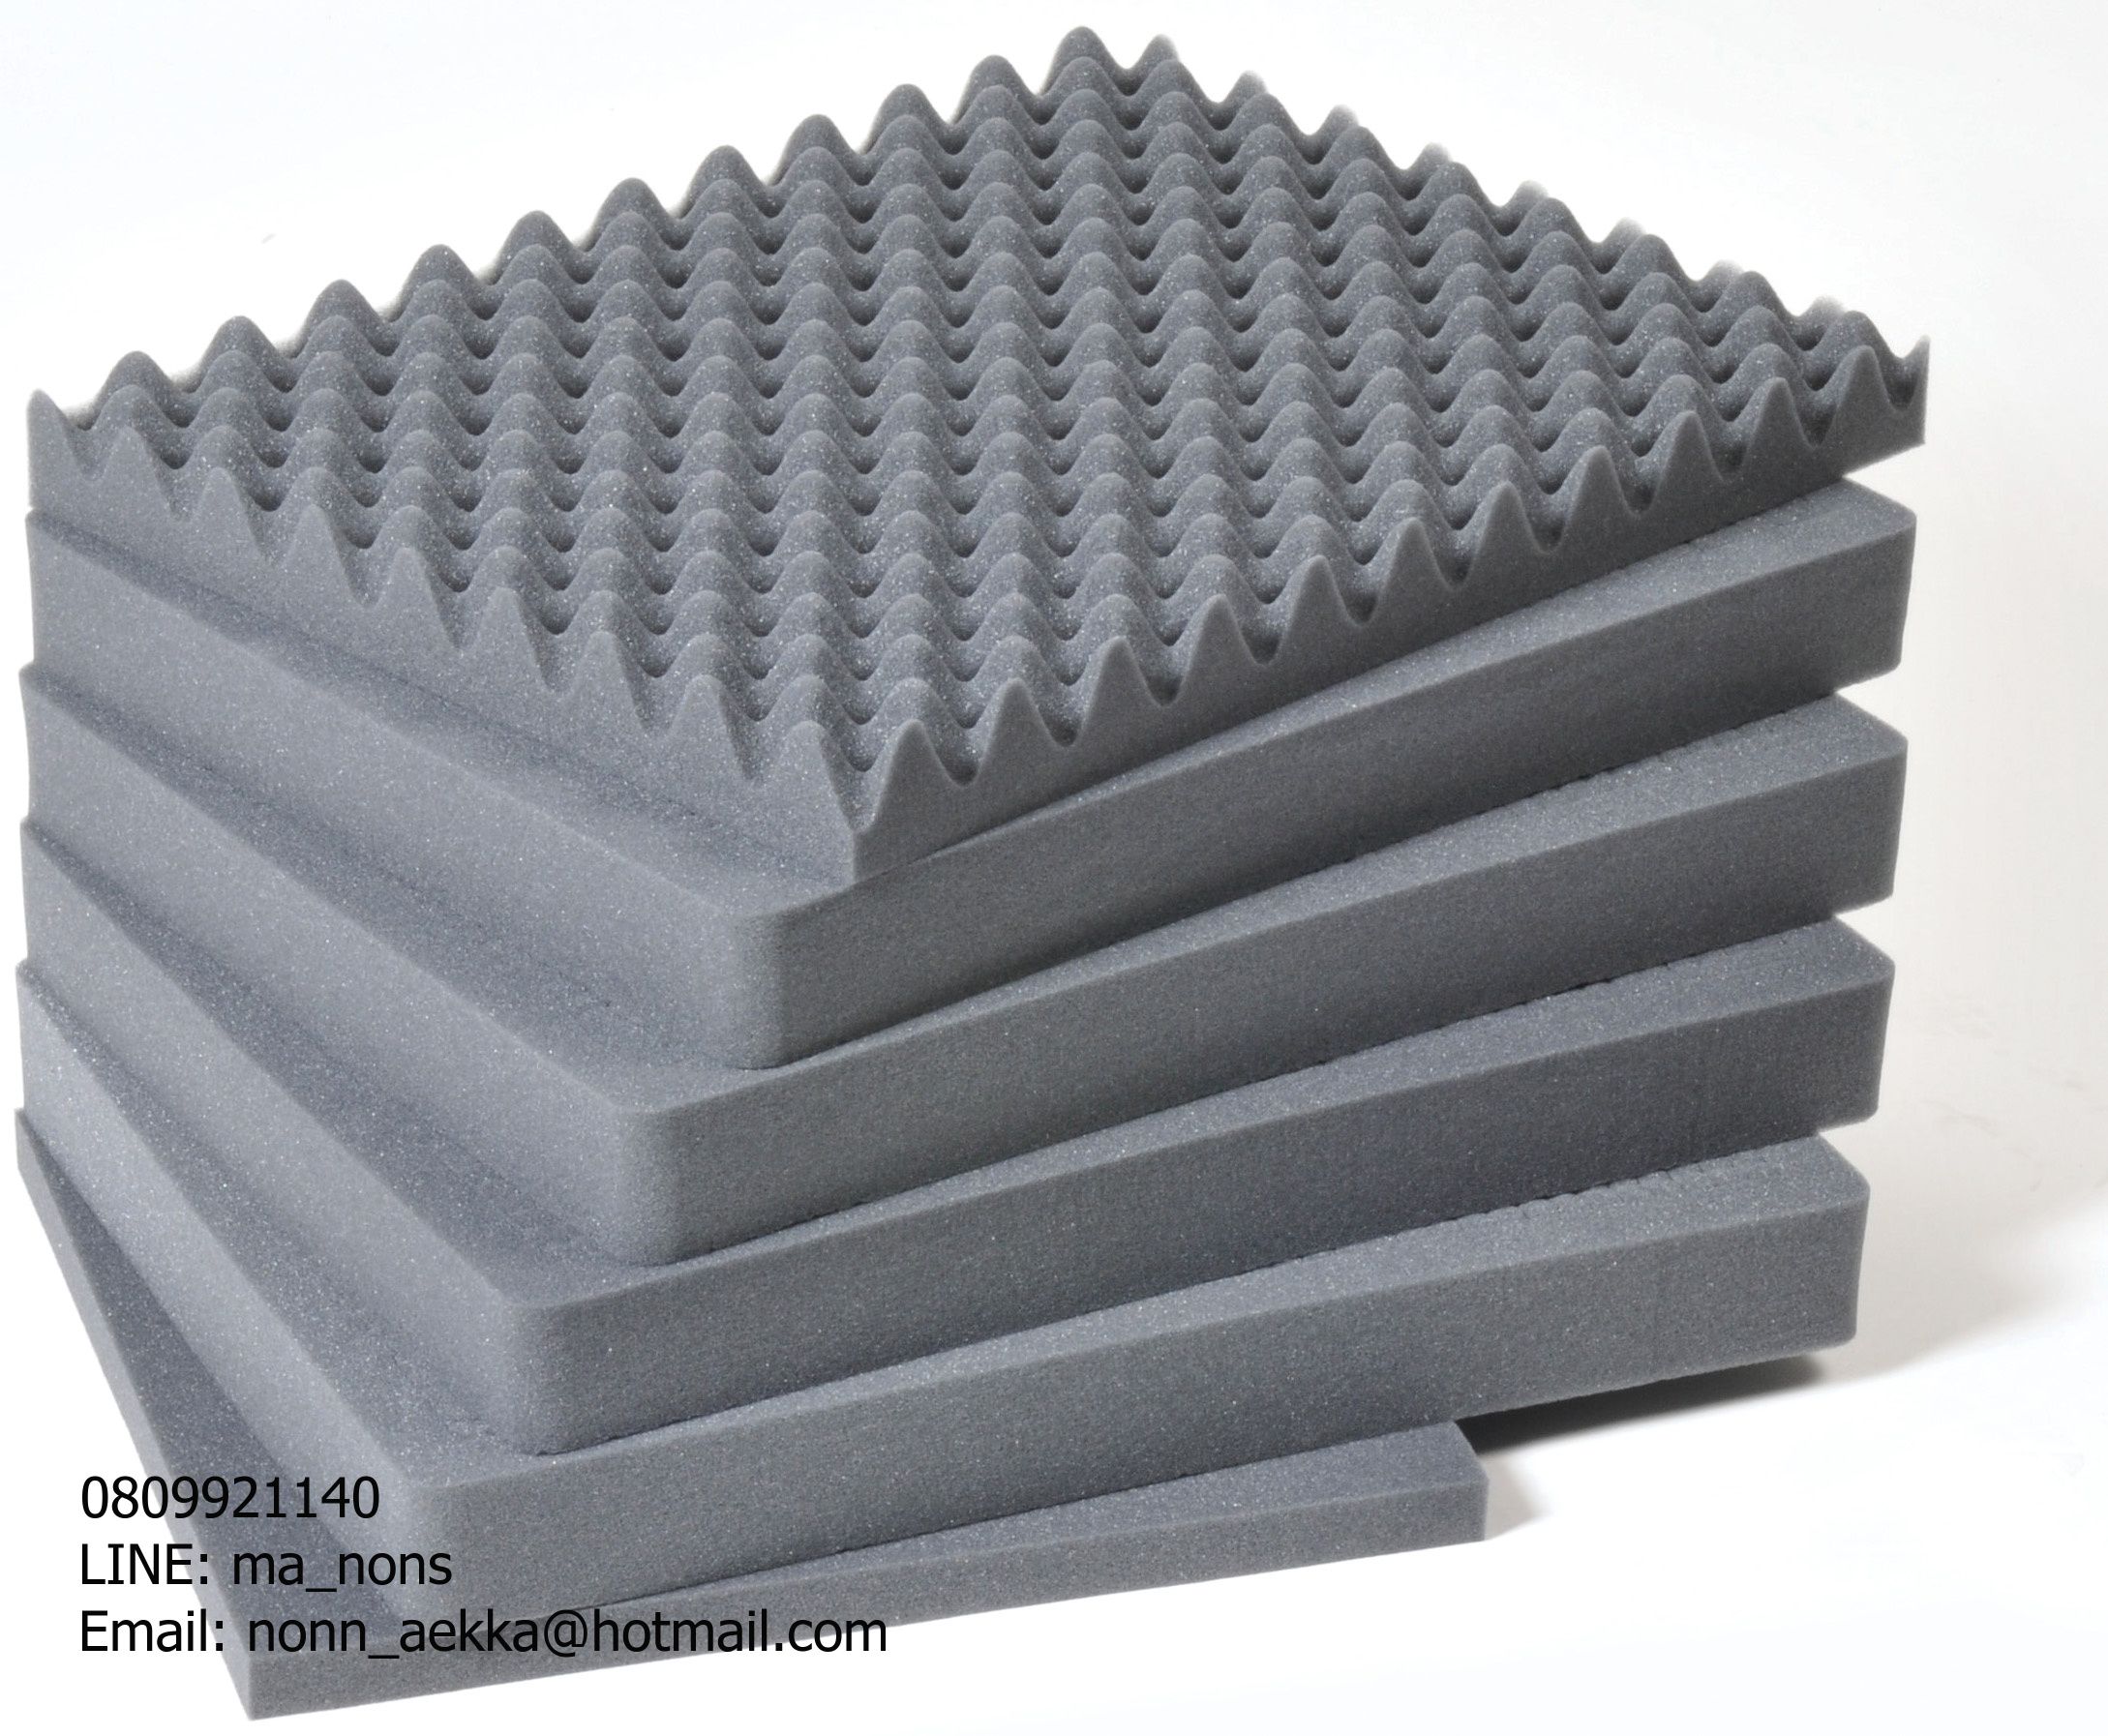 PELICAN™ Replacement Foam #1620 (5pcs Set)